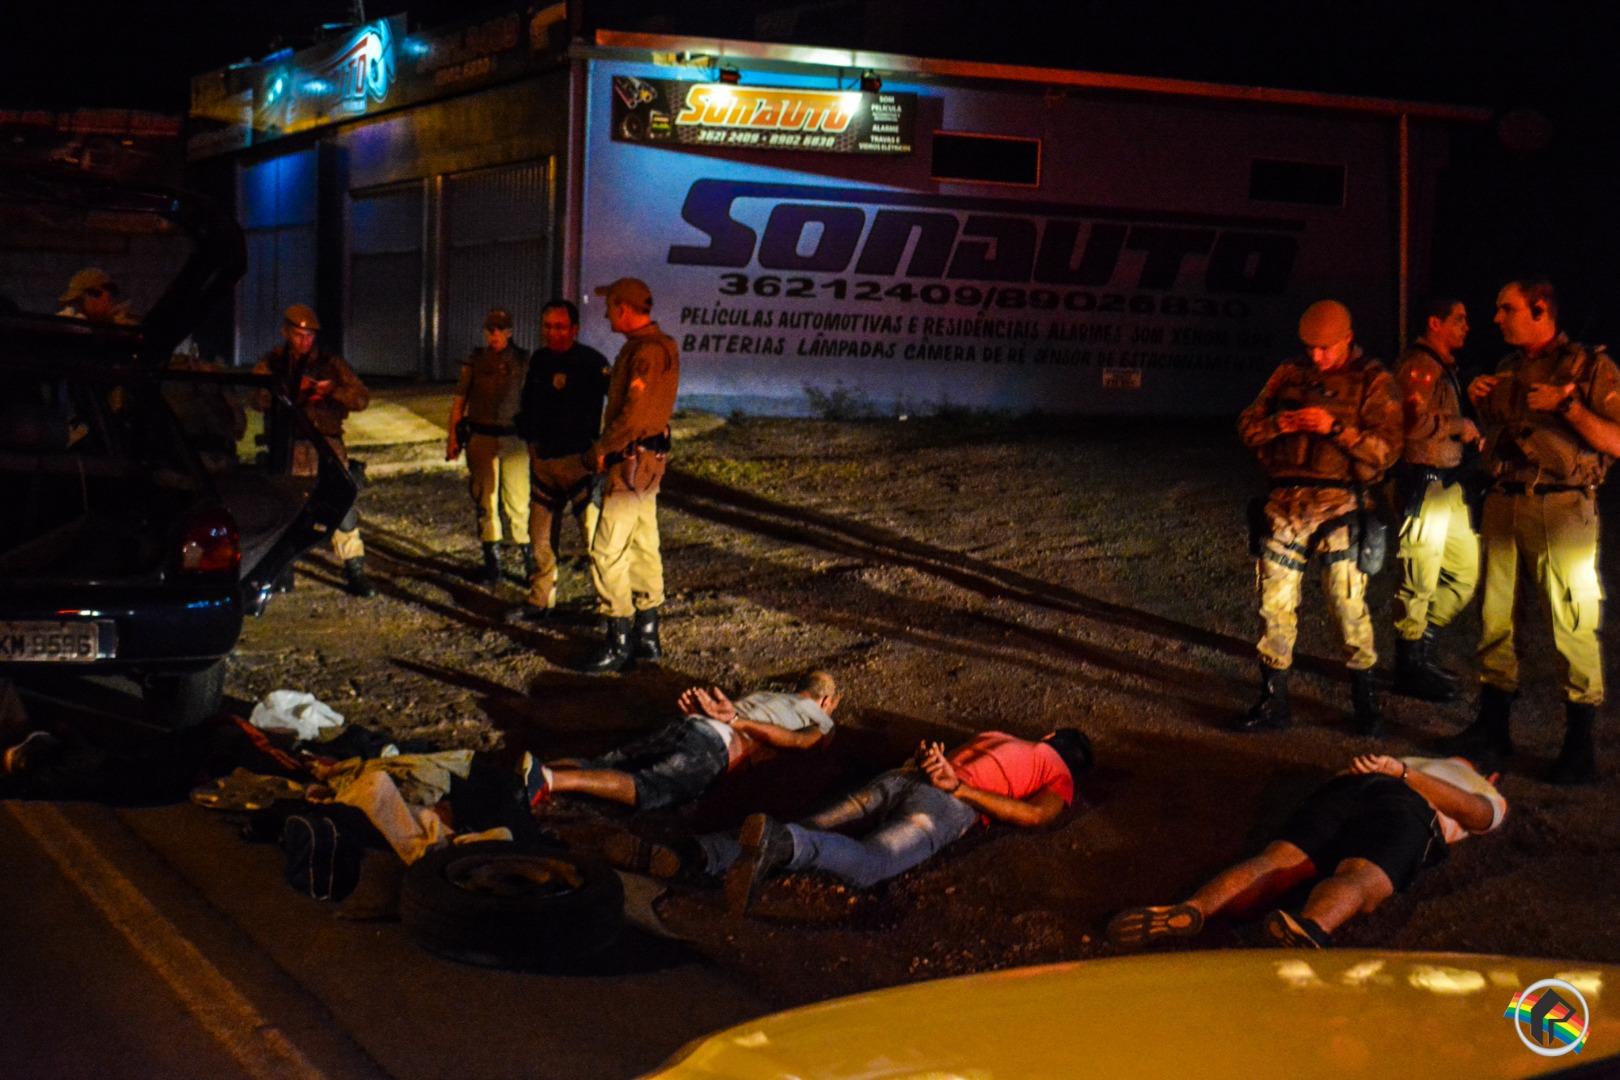 VÍDEO: PM prende suspeitos de assalto em frigorífico de Guaraciaba